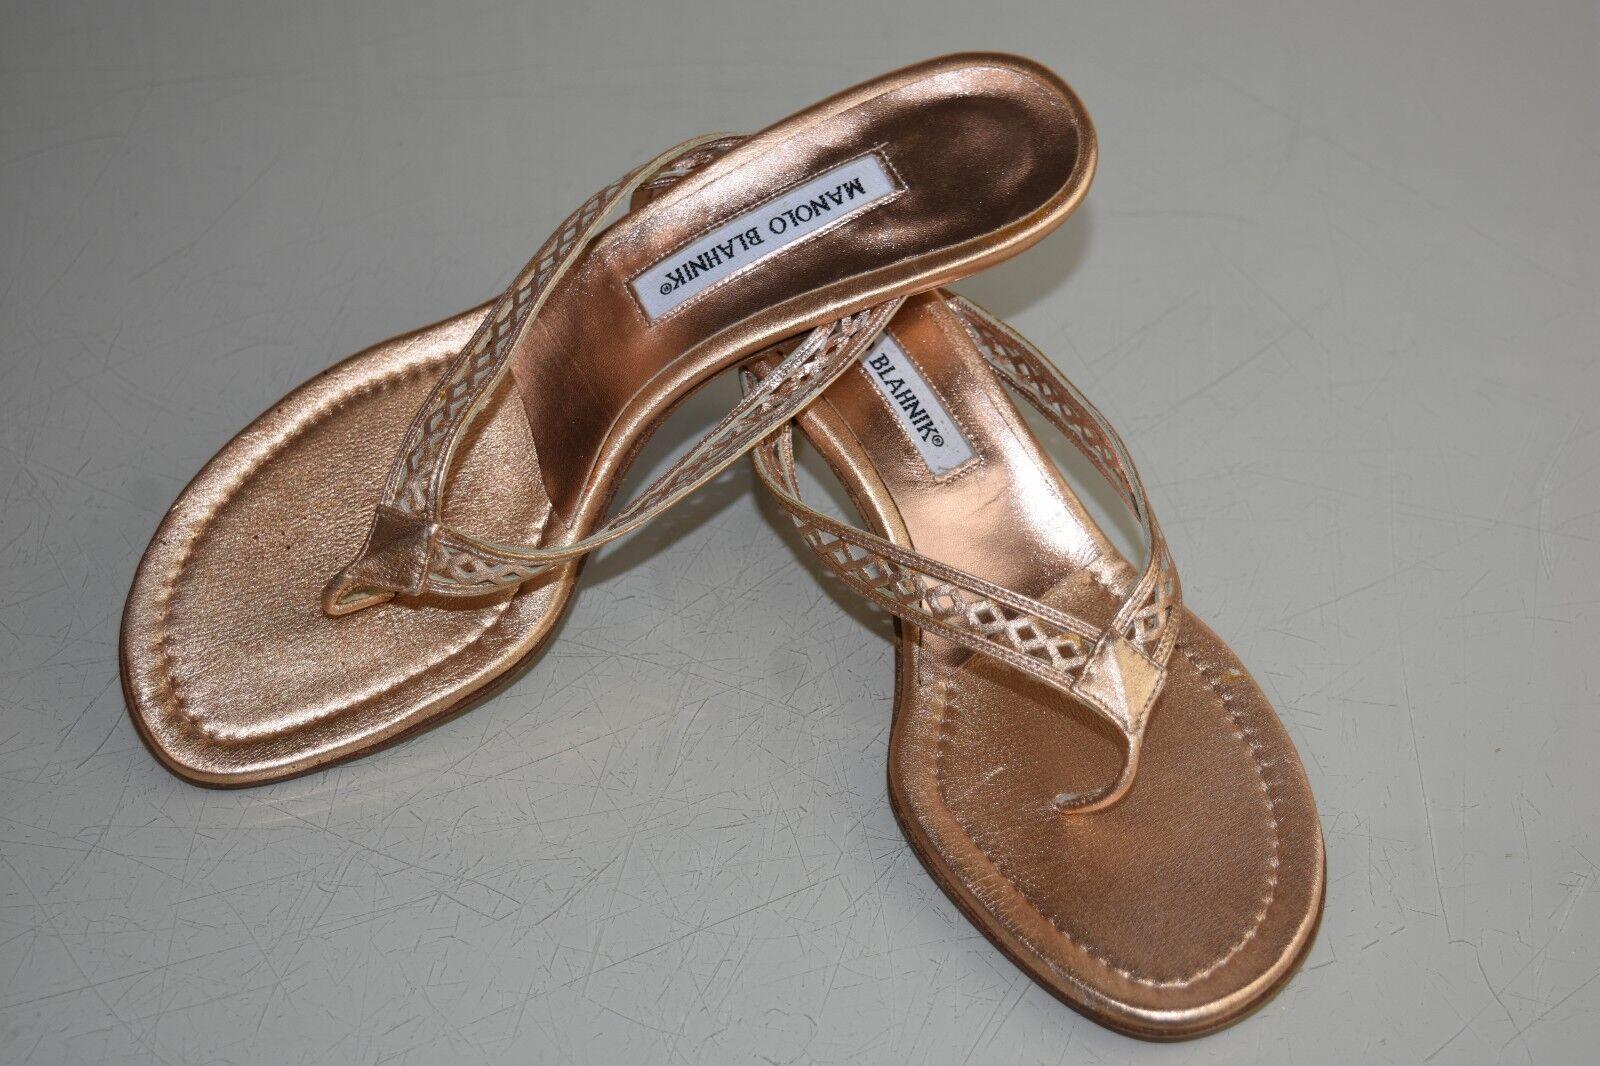 New Manolo Blahnik Thong Slide Kitten Heels Sandals Pink gold gold gold Shimmer shoes 41.5 4a916c